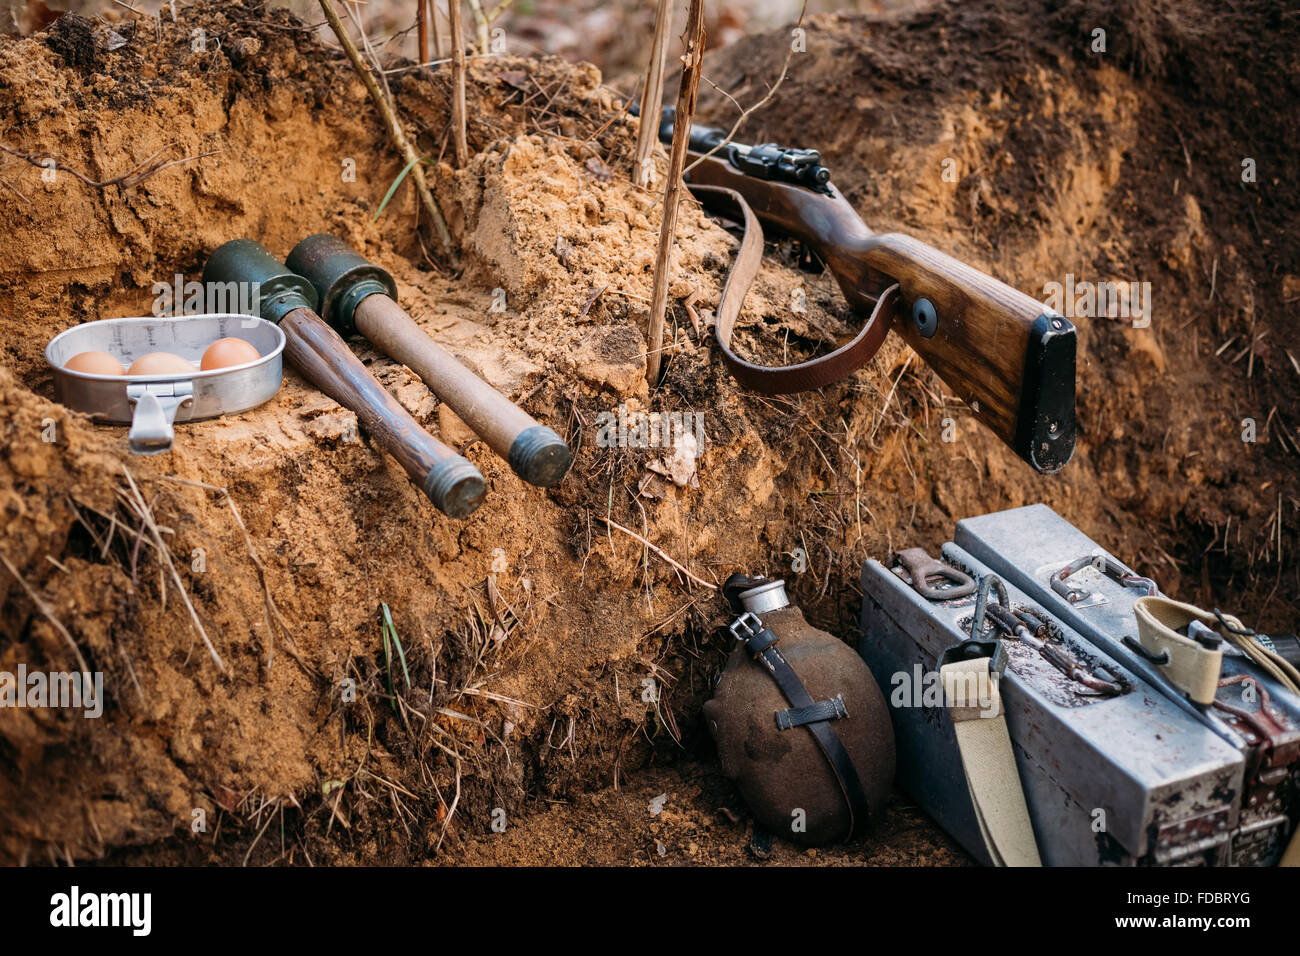 German military ammunition of World War II on ground. Rifle, grenades, flask. - Stock Image